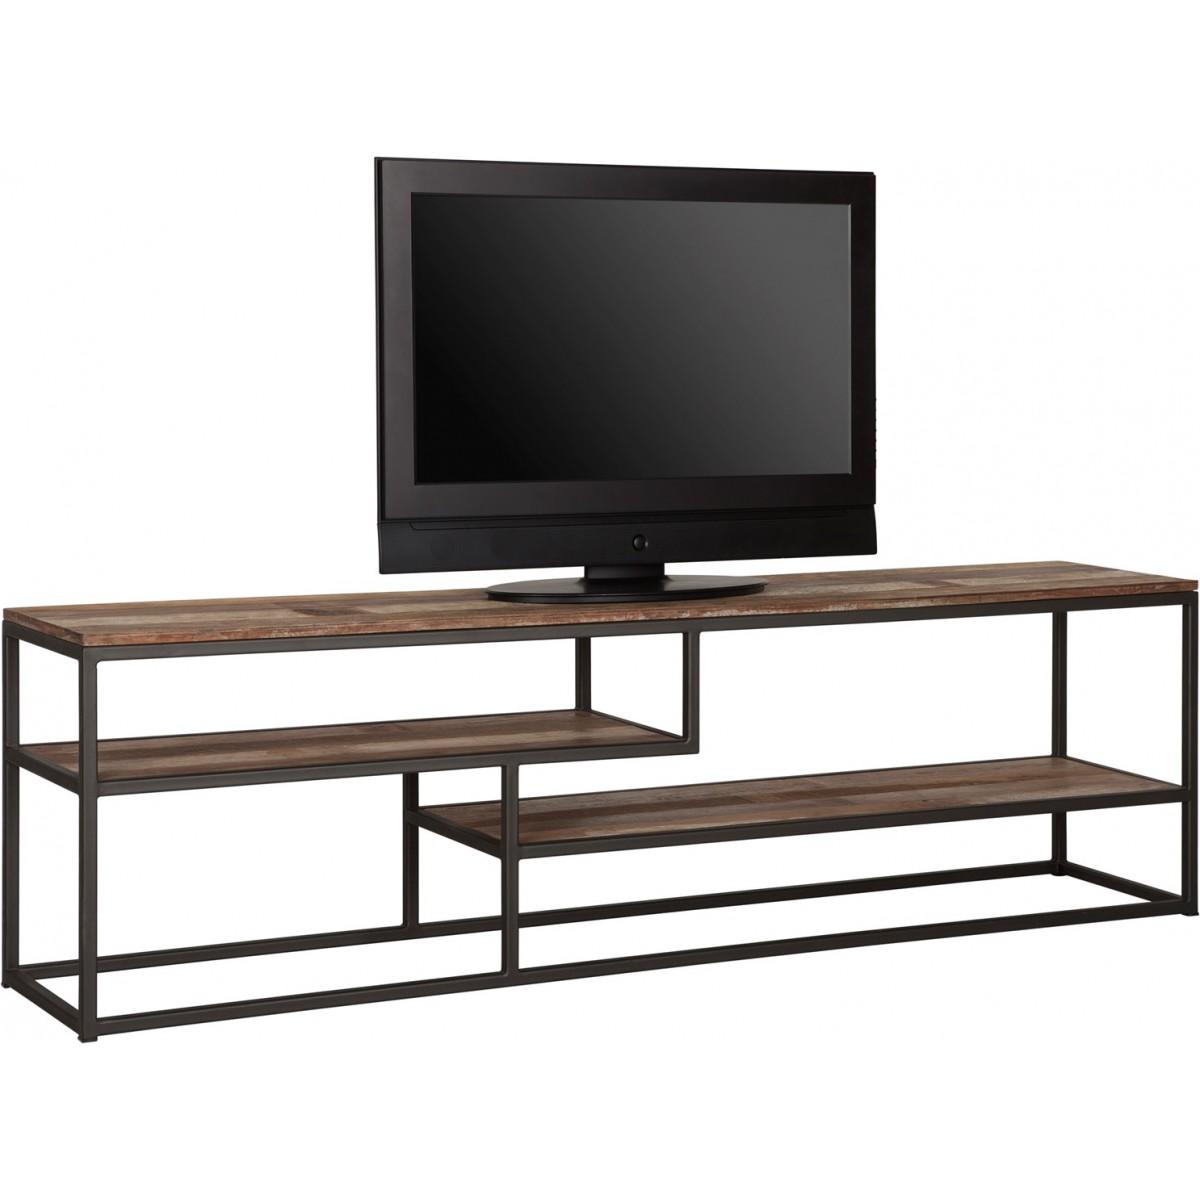 tuareg-dbhodi-tv-meubel-no2-50x175x35-cm-miltonhouse